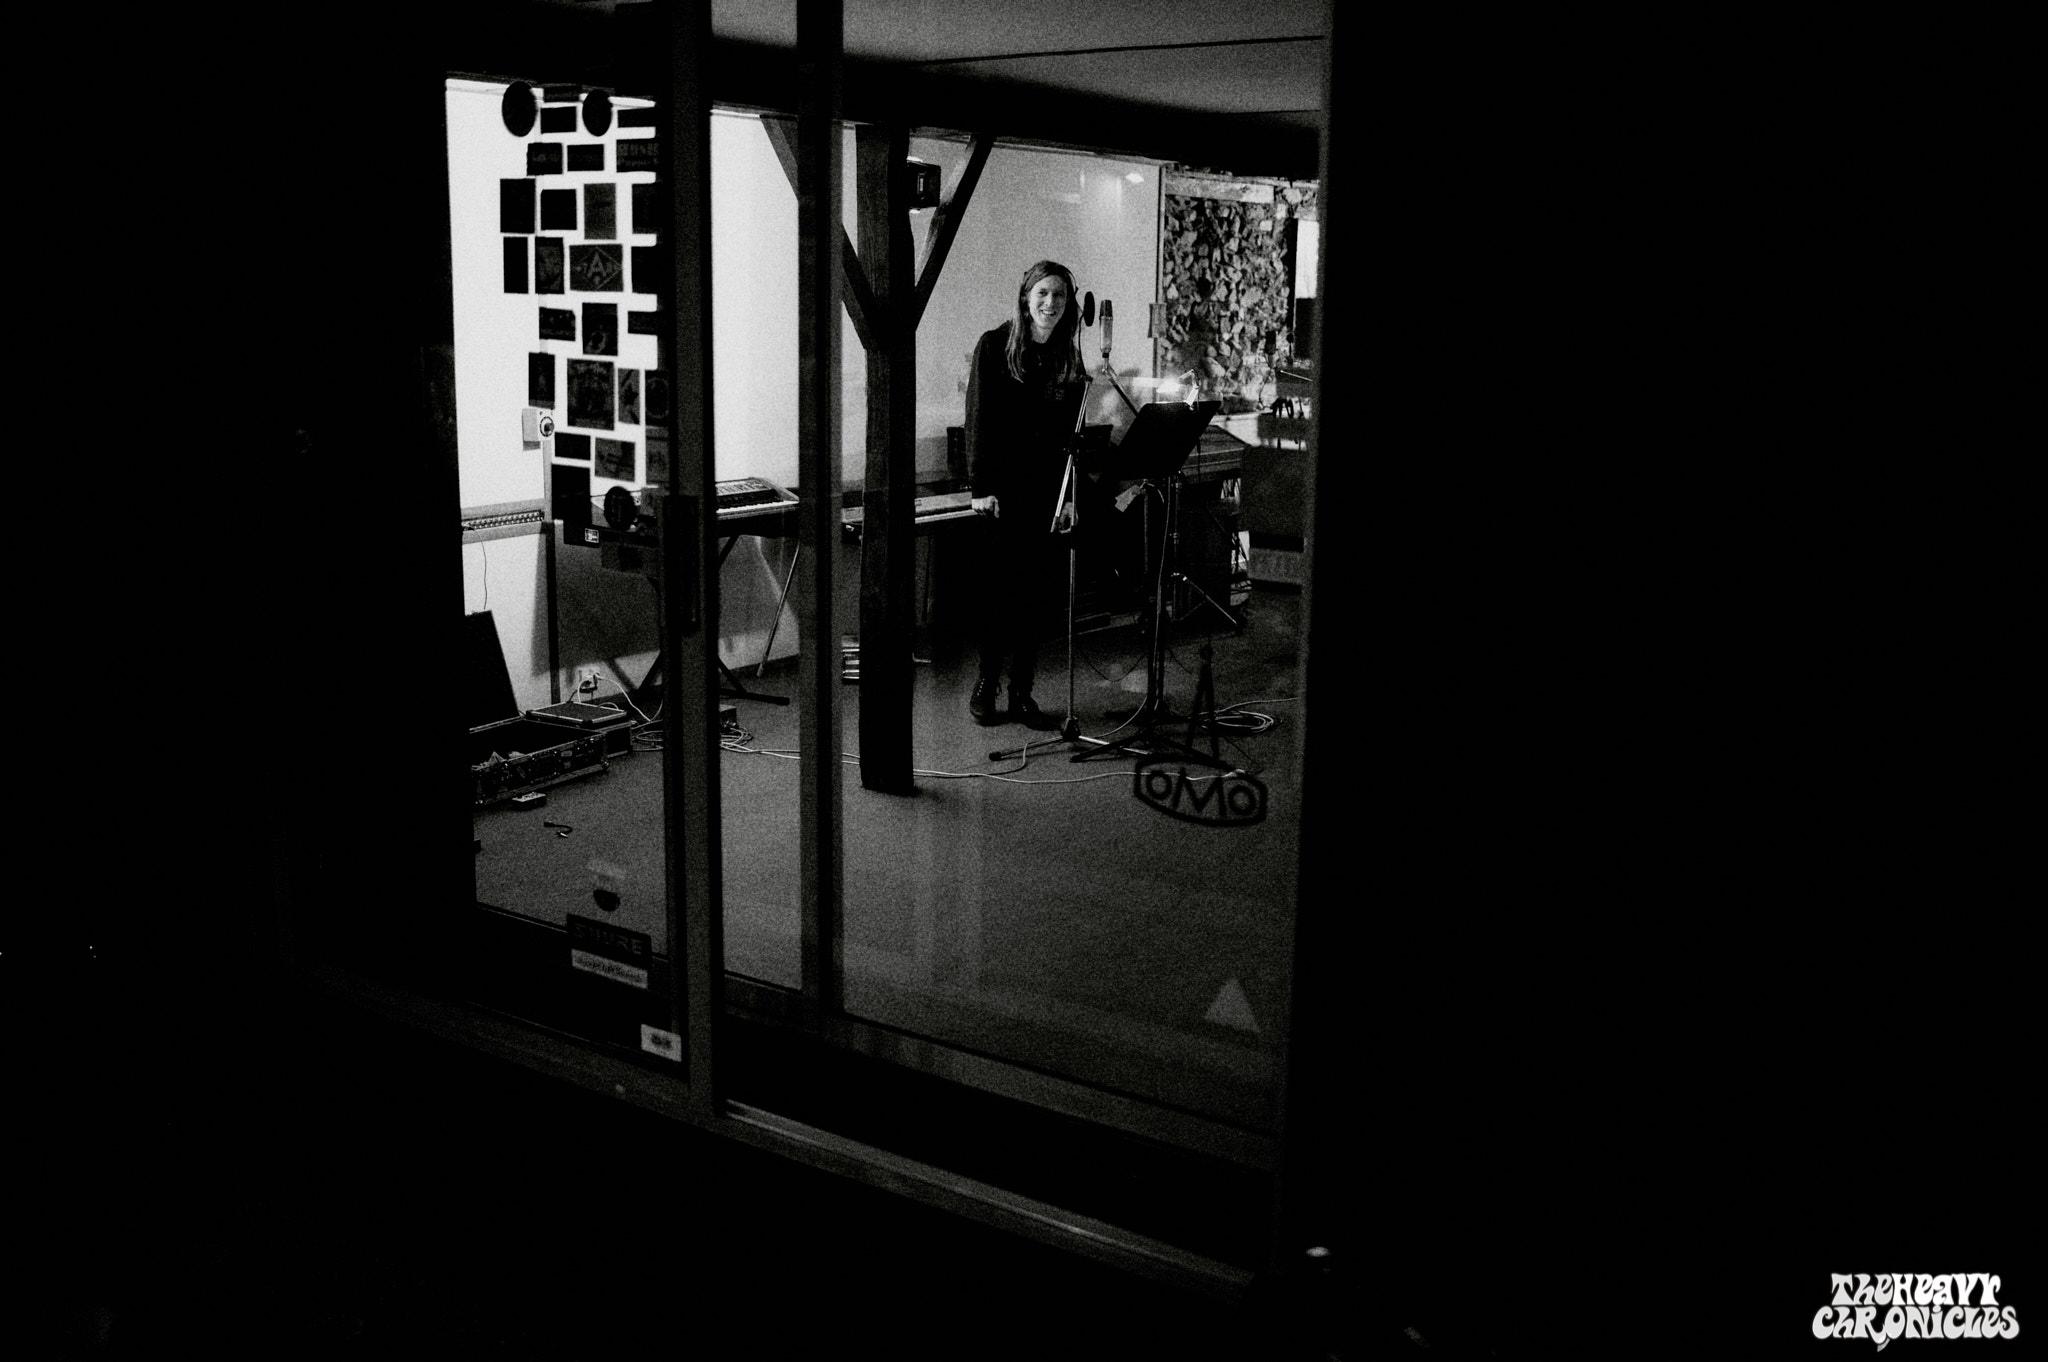 Elder-Studio-Black-Box-2019-Gael-Mathieu-The-Heavy-Chronicles-44